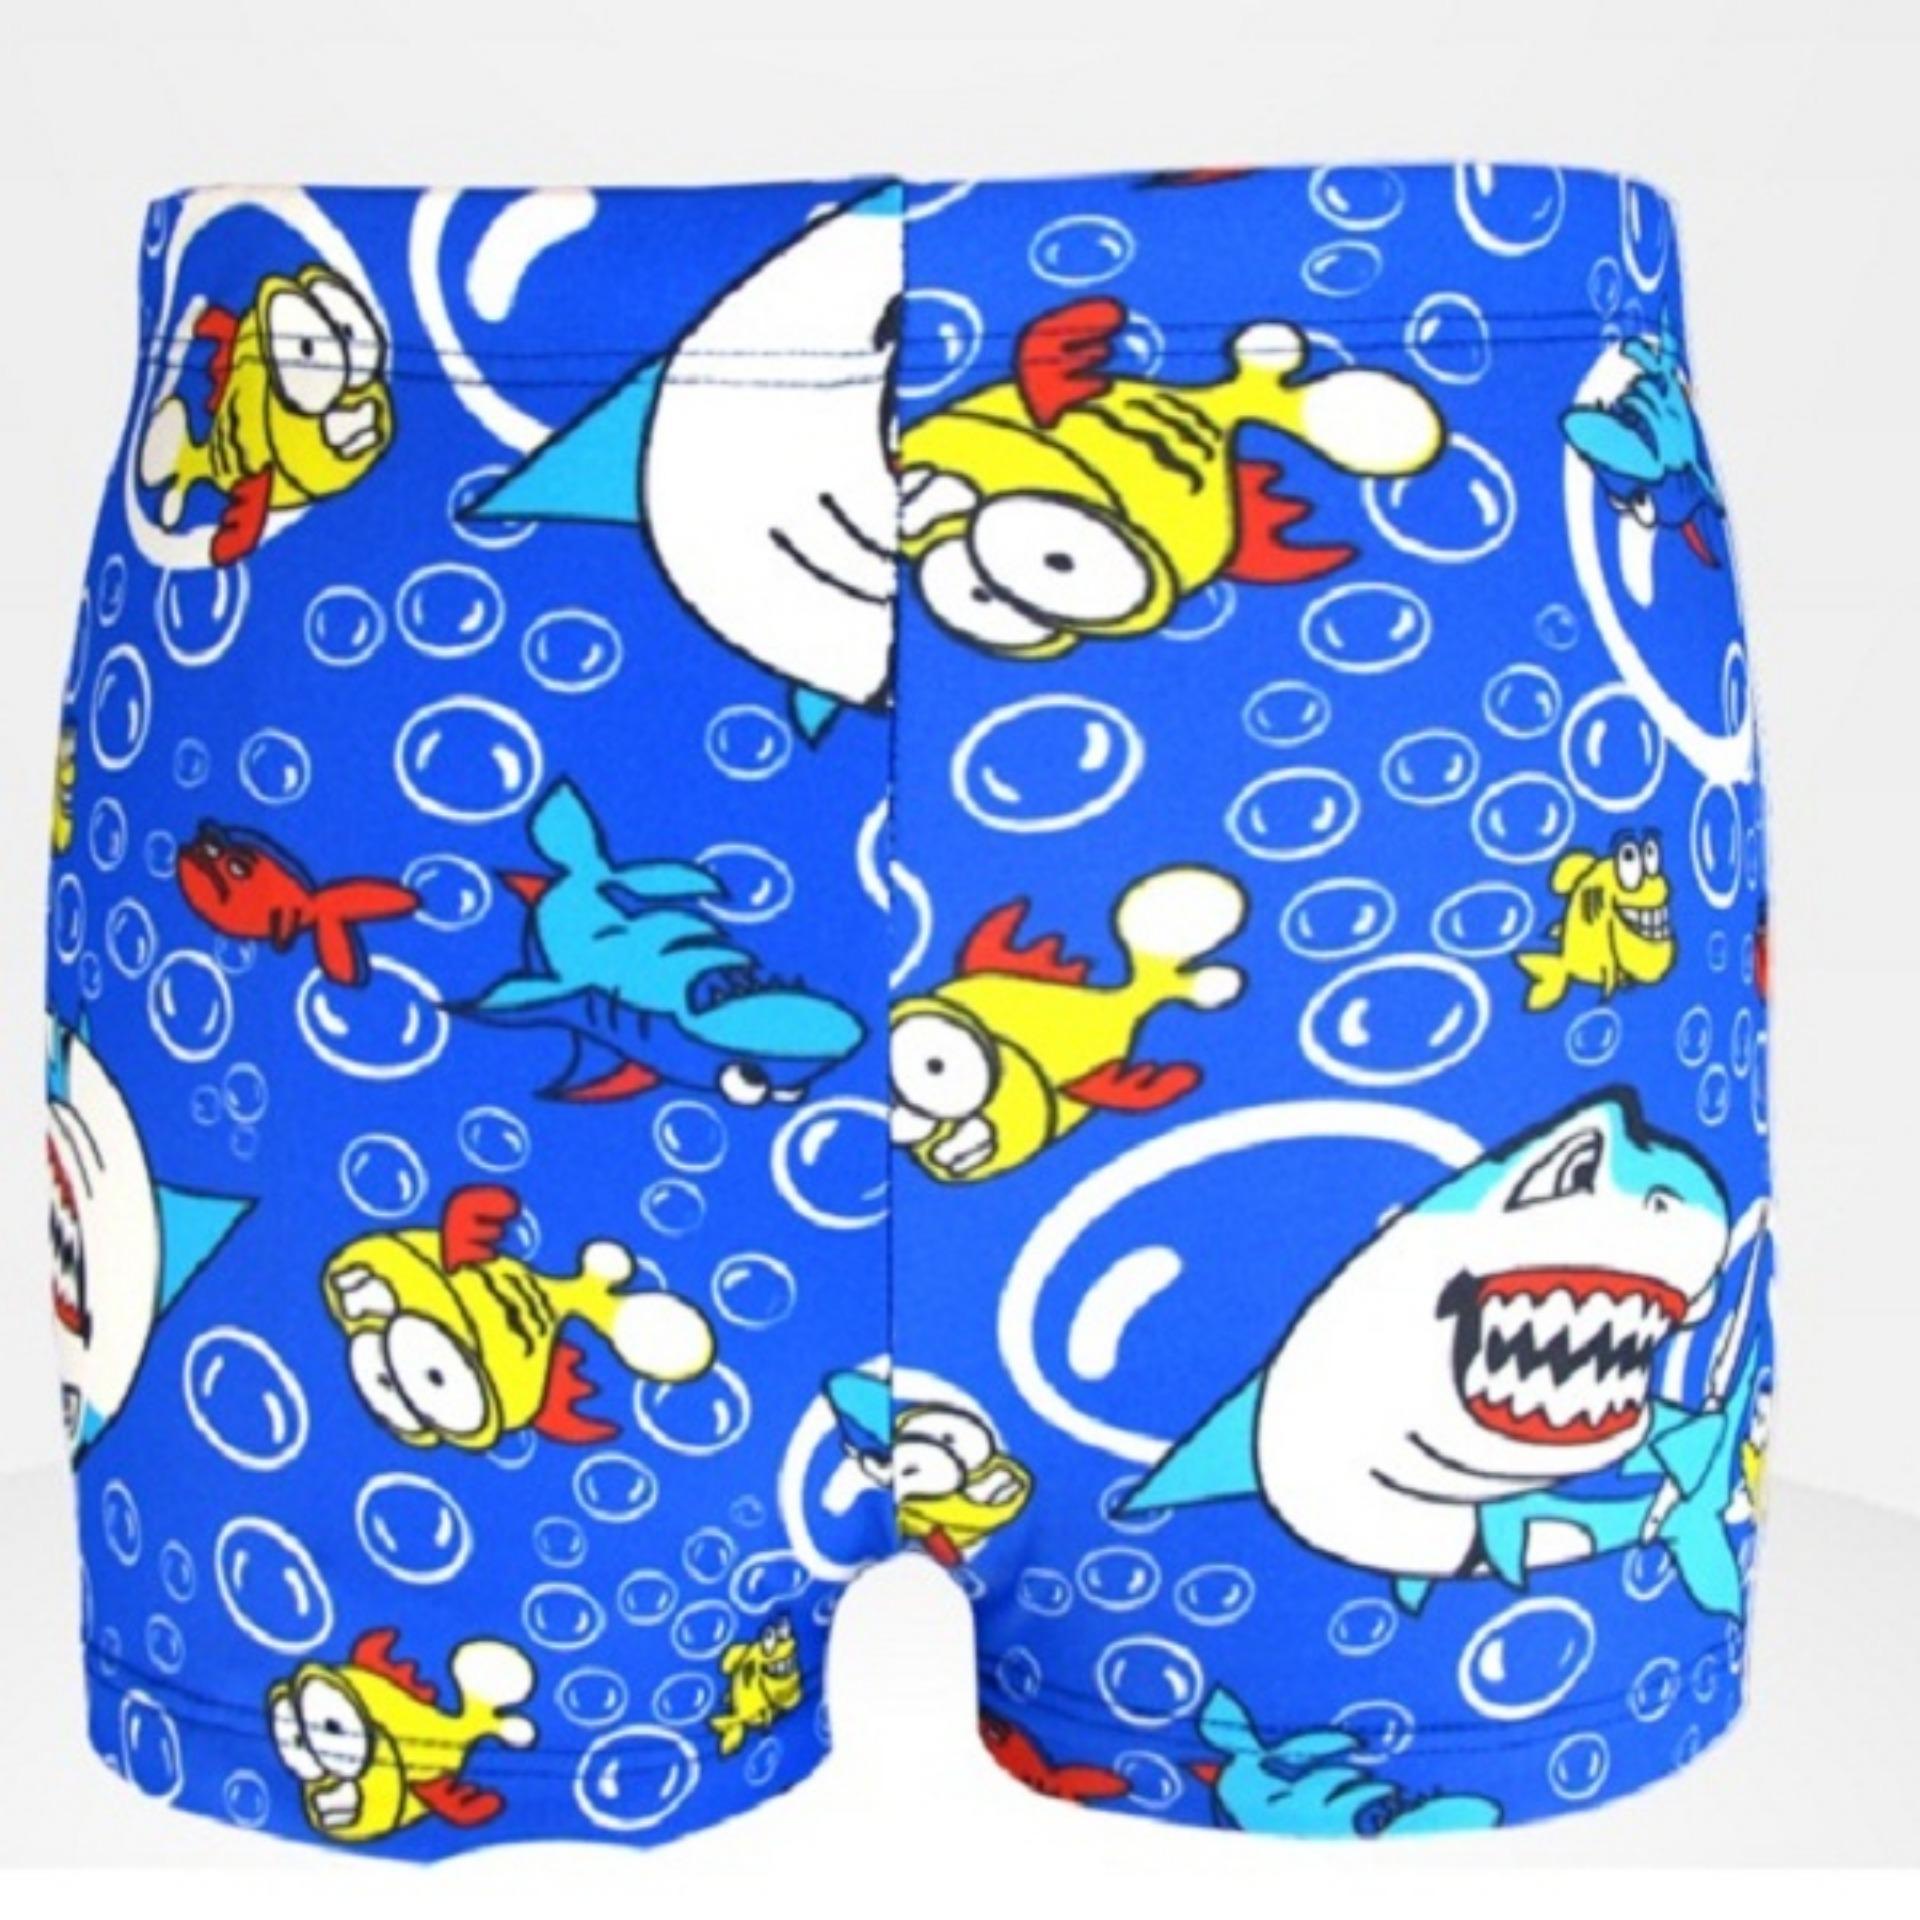 Jual Tas Pria Waistbag Distro Bandung 03 Harga Rp 40700 03b Flykids Celana Renang Anak Laki Underwear Fks 3099